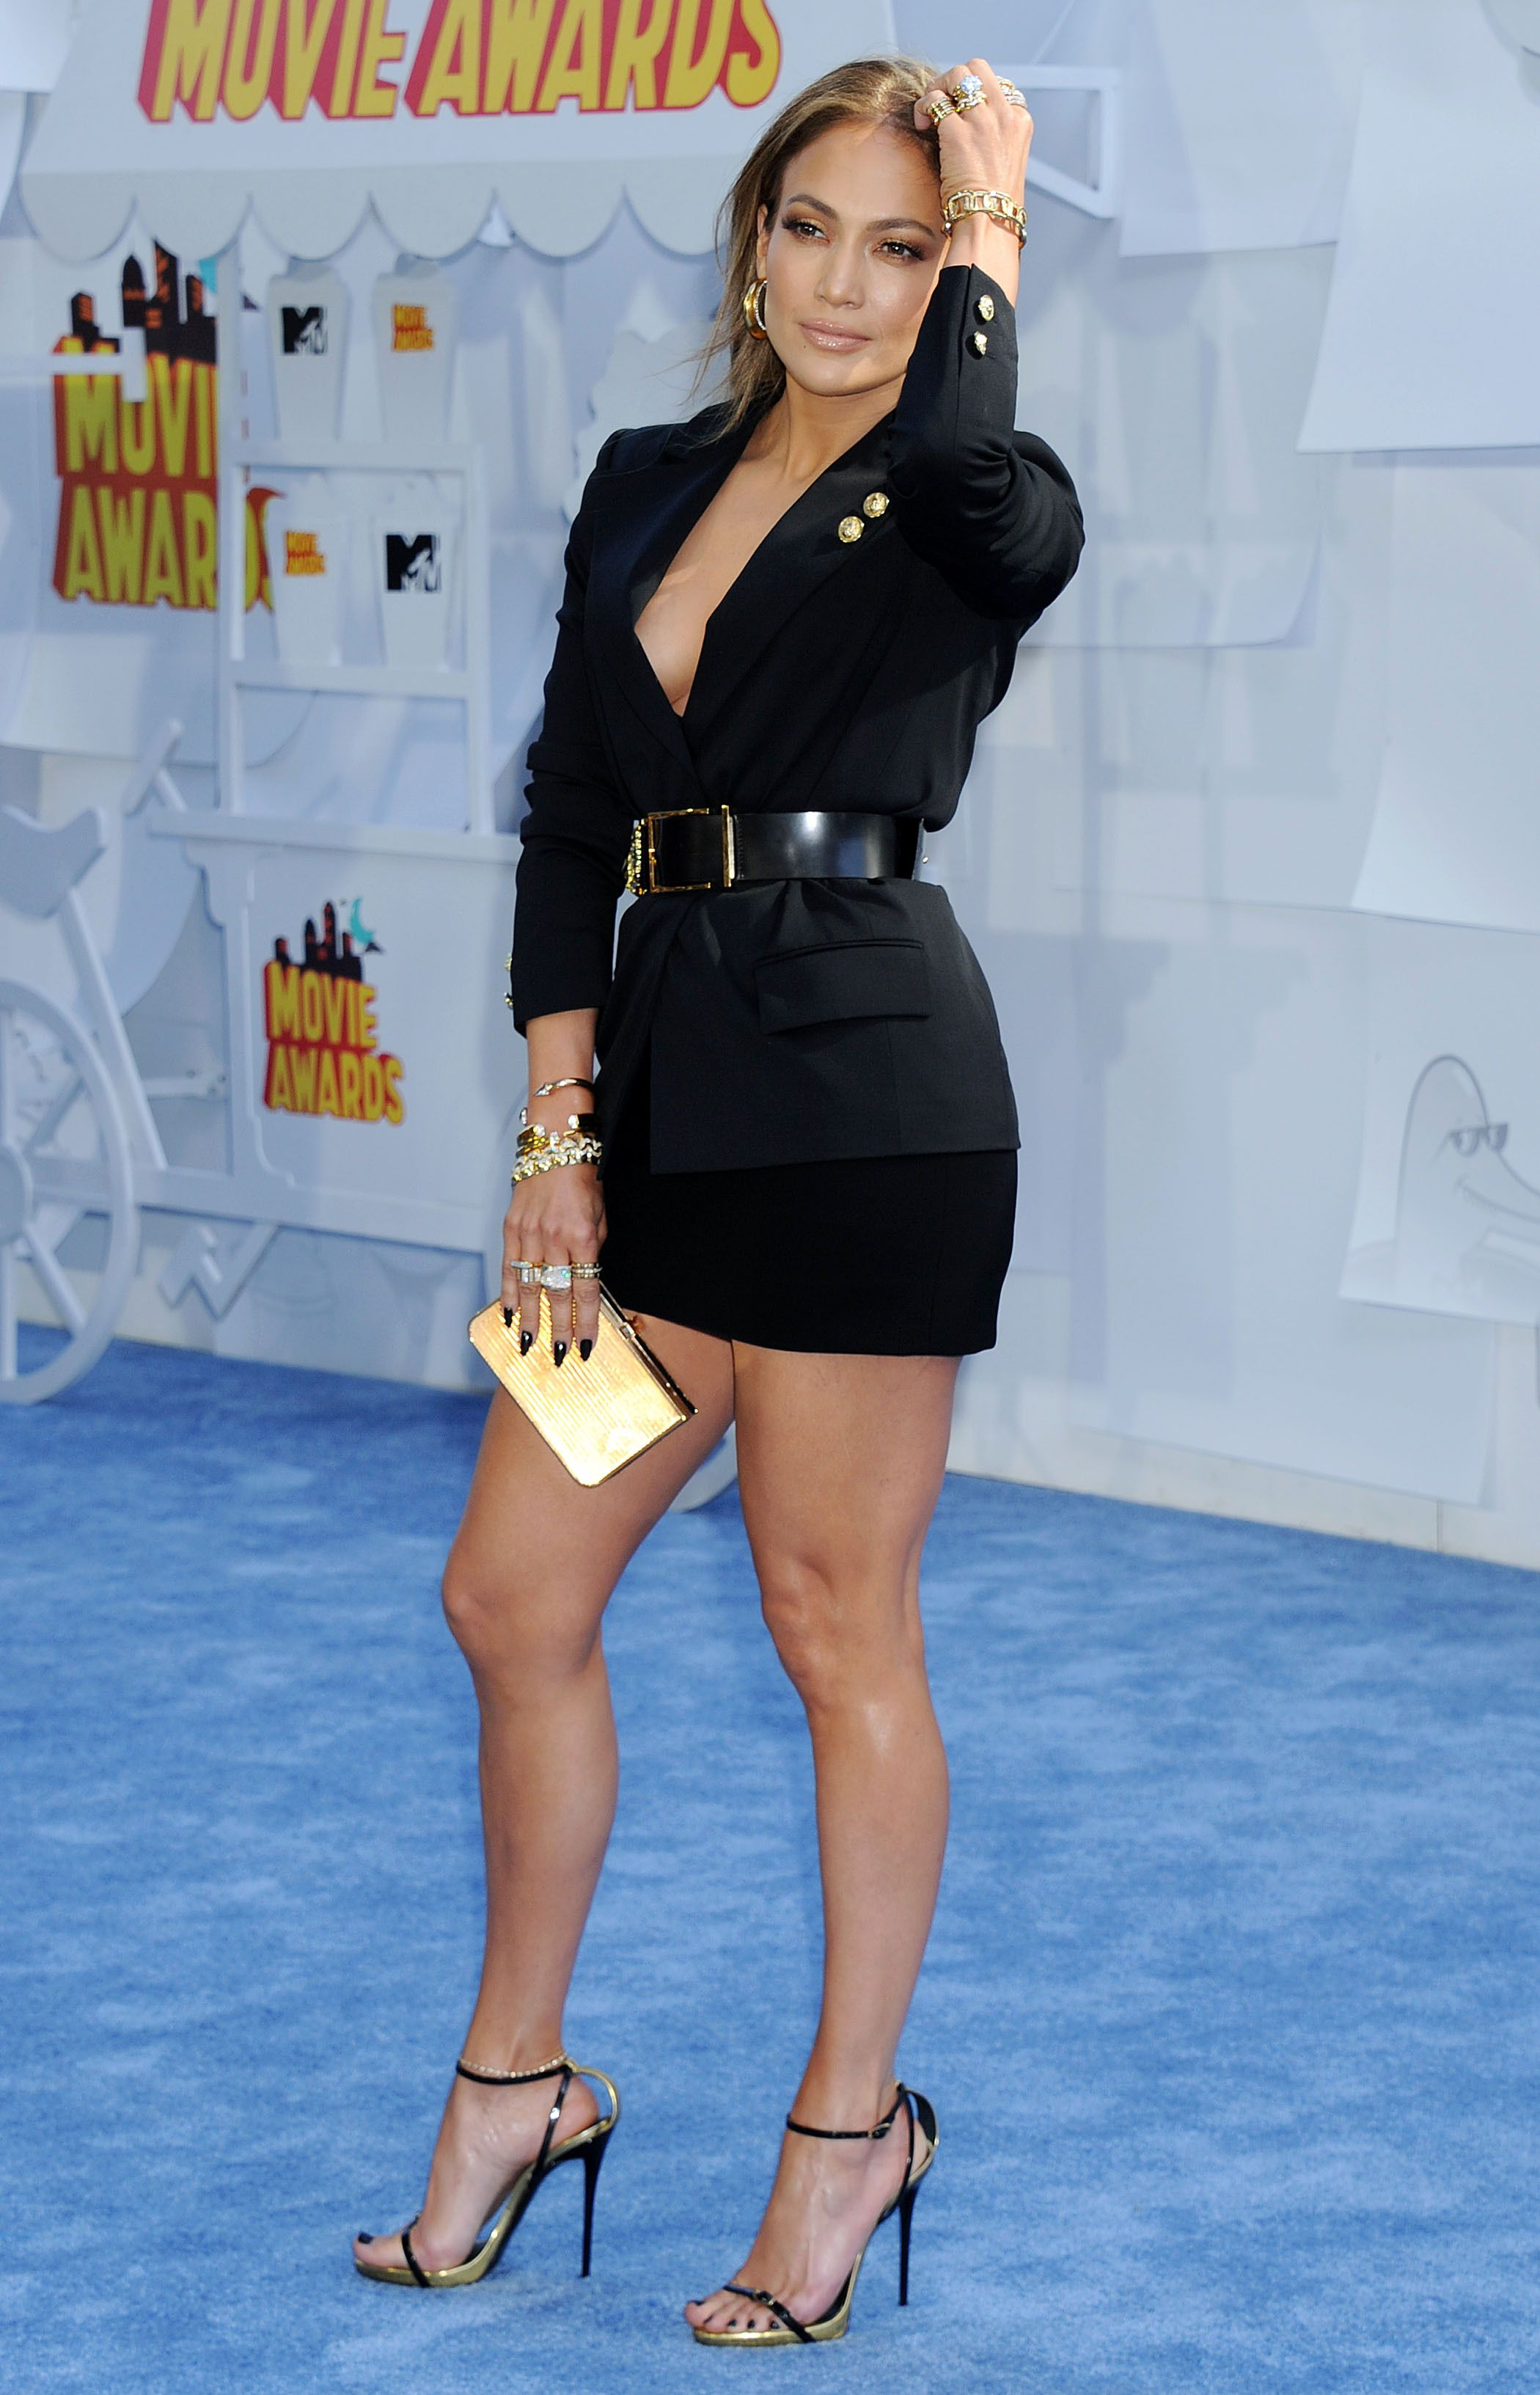 Jennifer-Lopez-Feet-1662556.jpg (2100×3265) | Jennifer Lopez | Pinterest